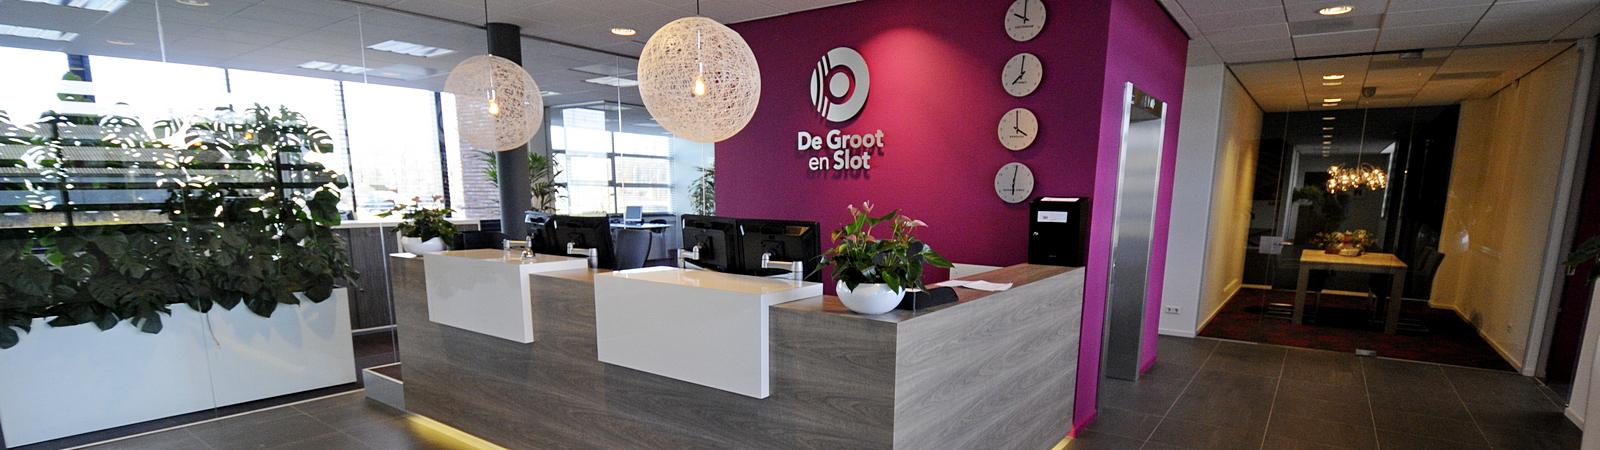 Perla entreemeubilair maatwerk De Groot en Slot panorama